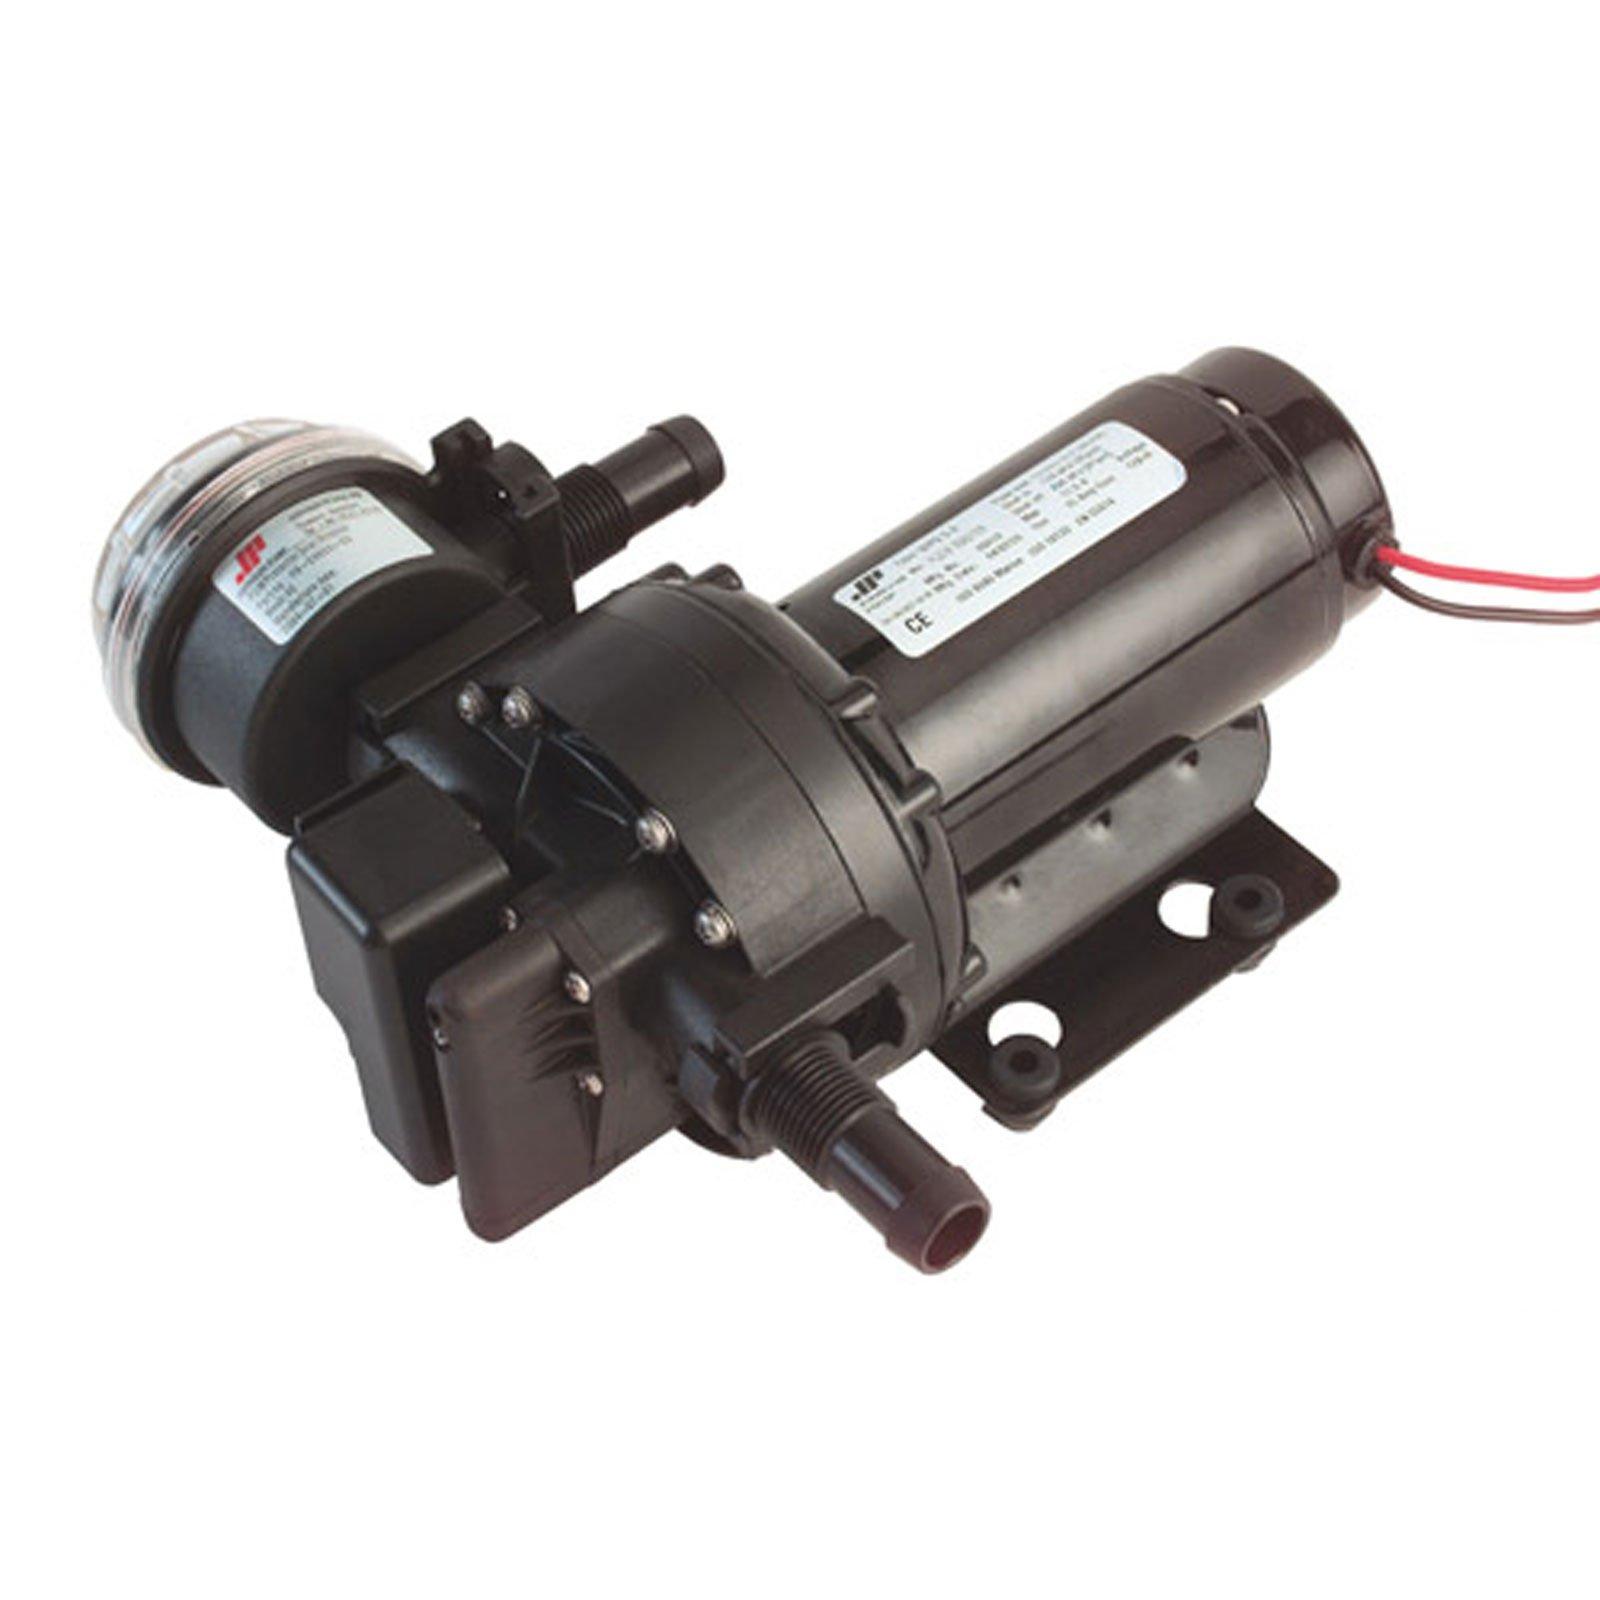 Johnson Pumps 10-13329-103 Master 5.0 GPM Variable Flow Demand Pump, 12V